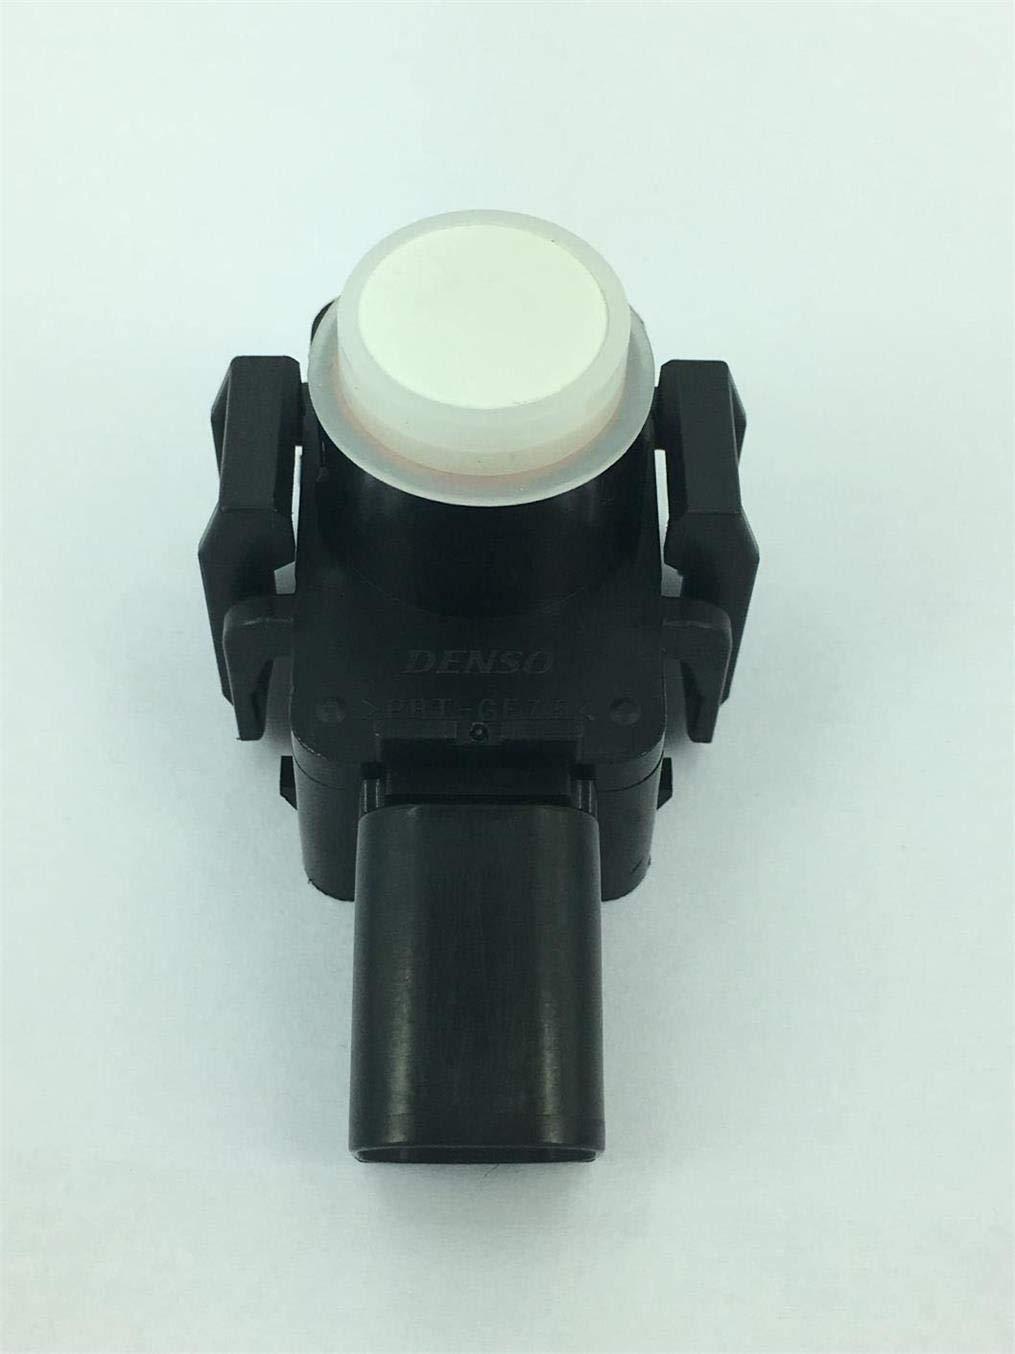 PDC Parking Sensor Bumper Reverse Assist Radar 89341-58070 Toyota Prius Hass Foshan Nanhai Auto Parts